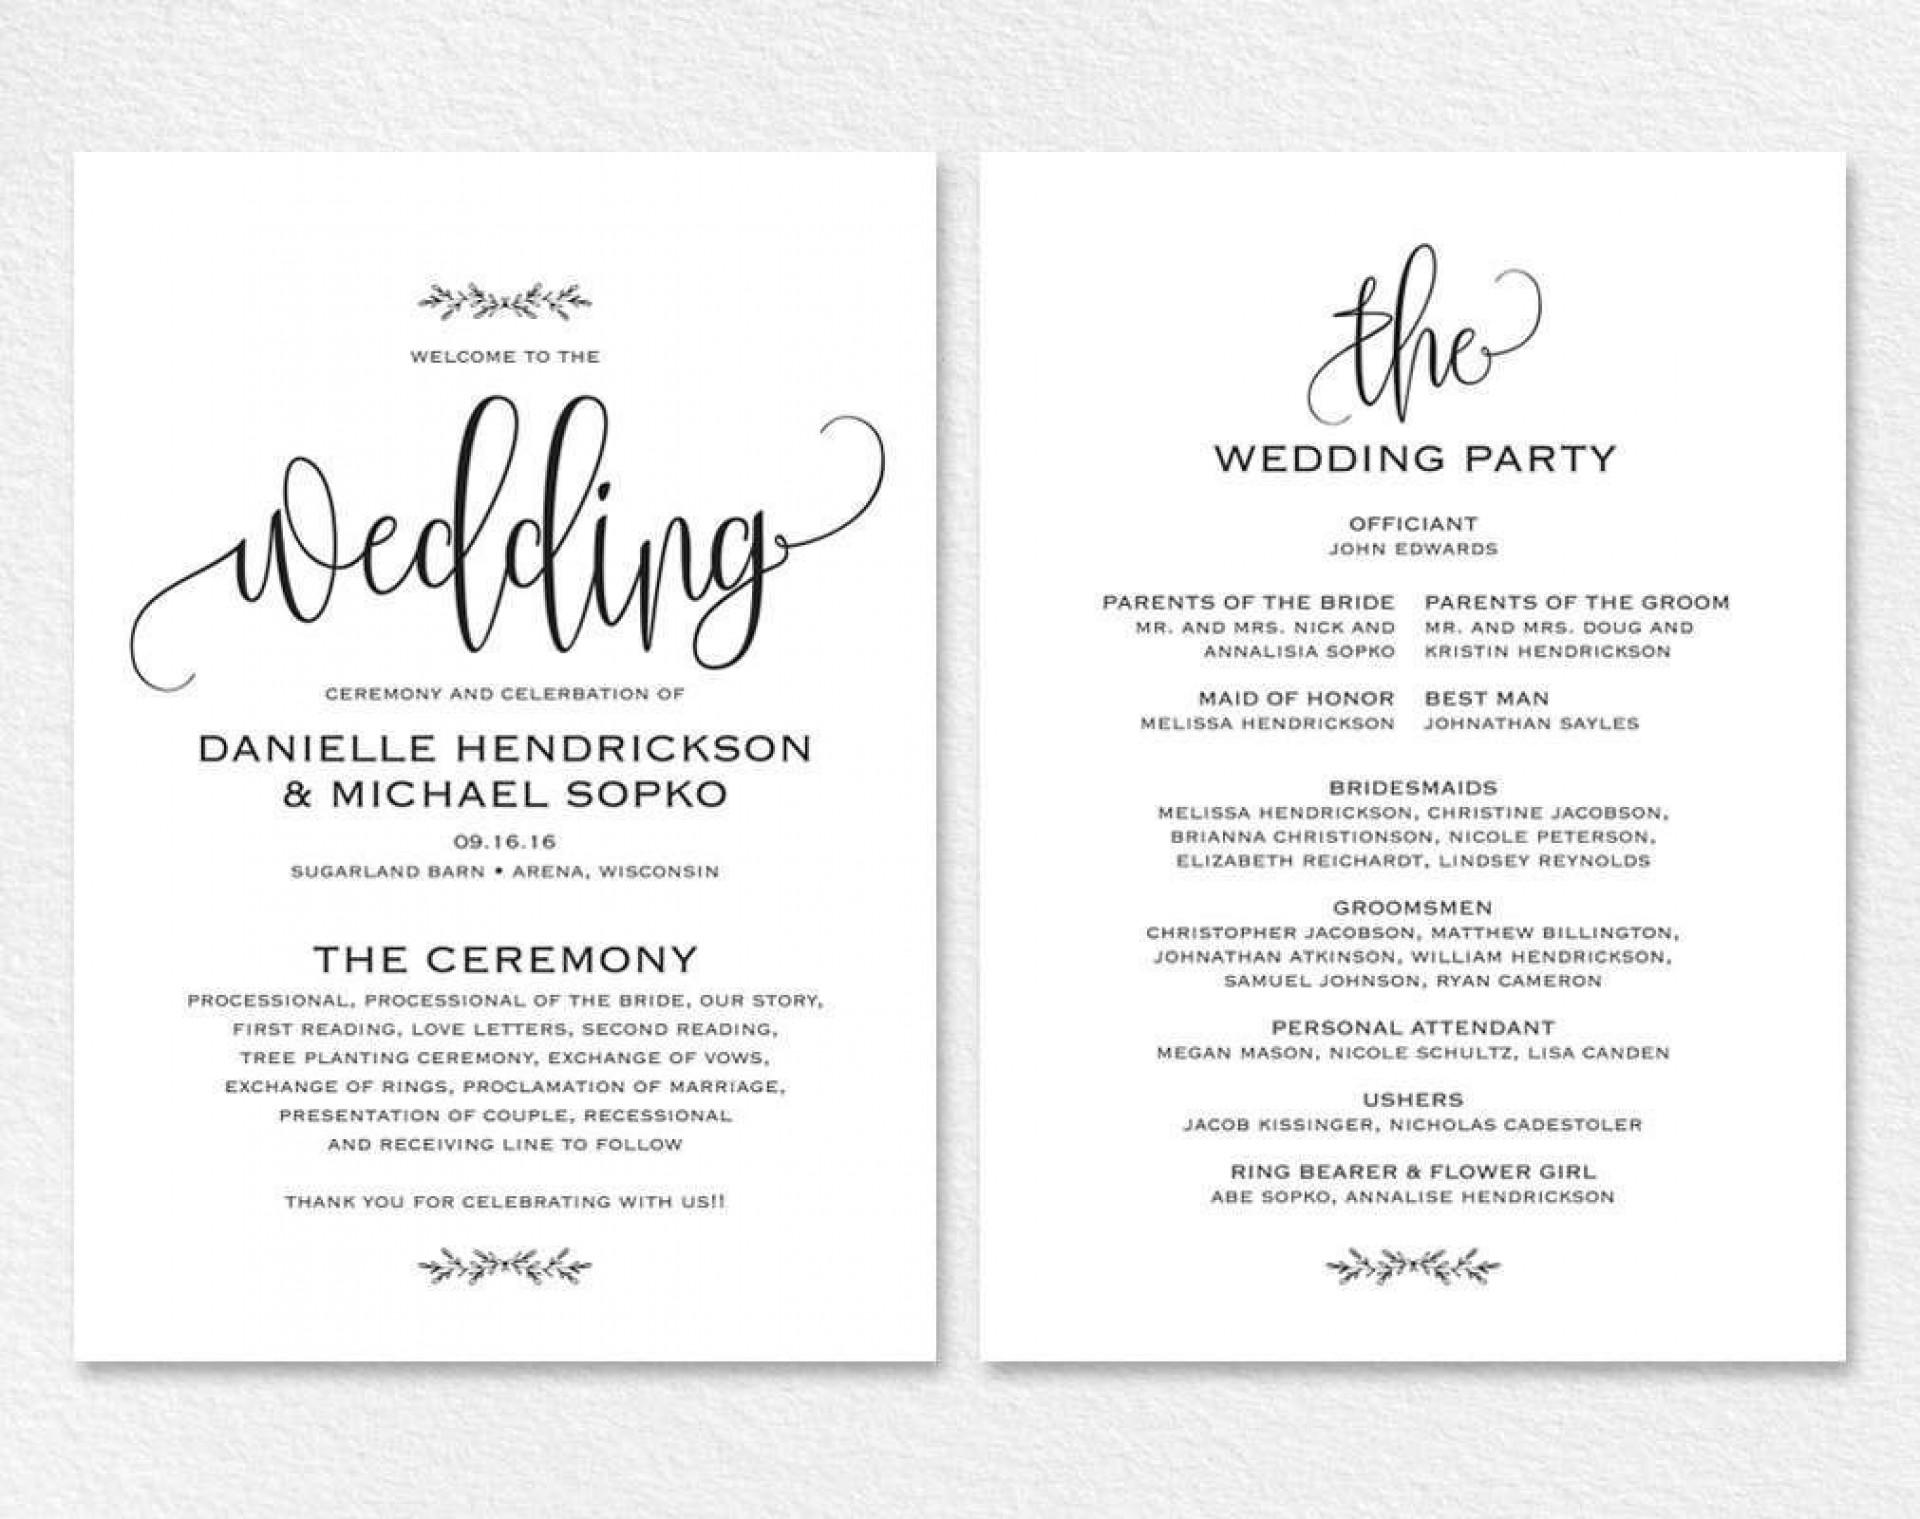 000 Stunning Formal Wedding Invitation Template Free Concept 1920